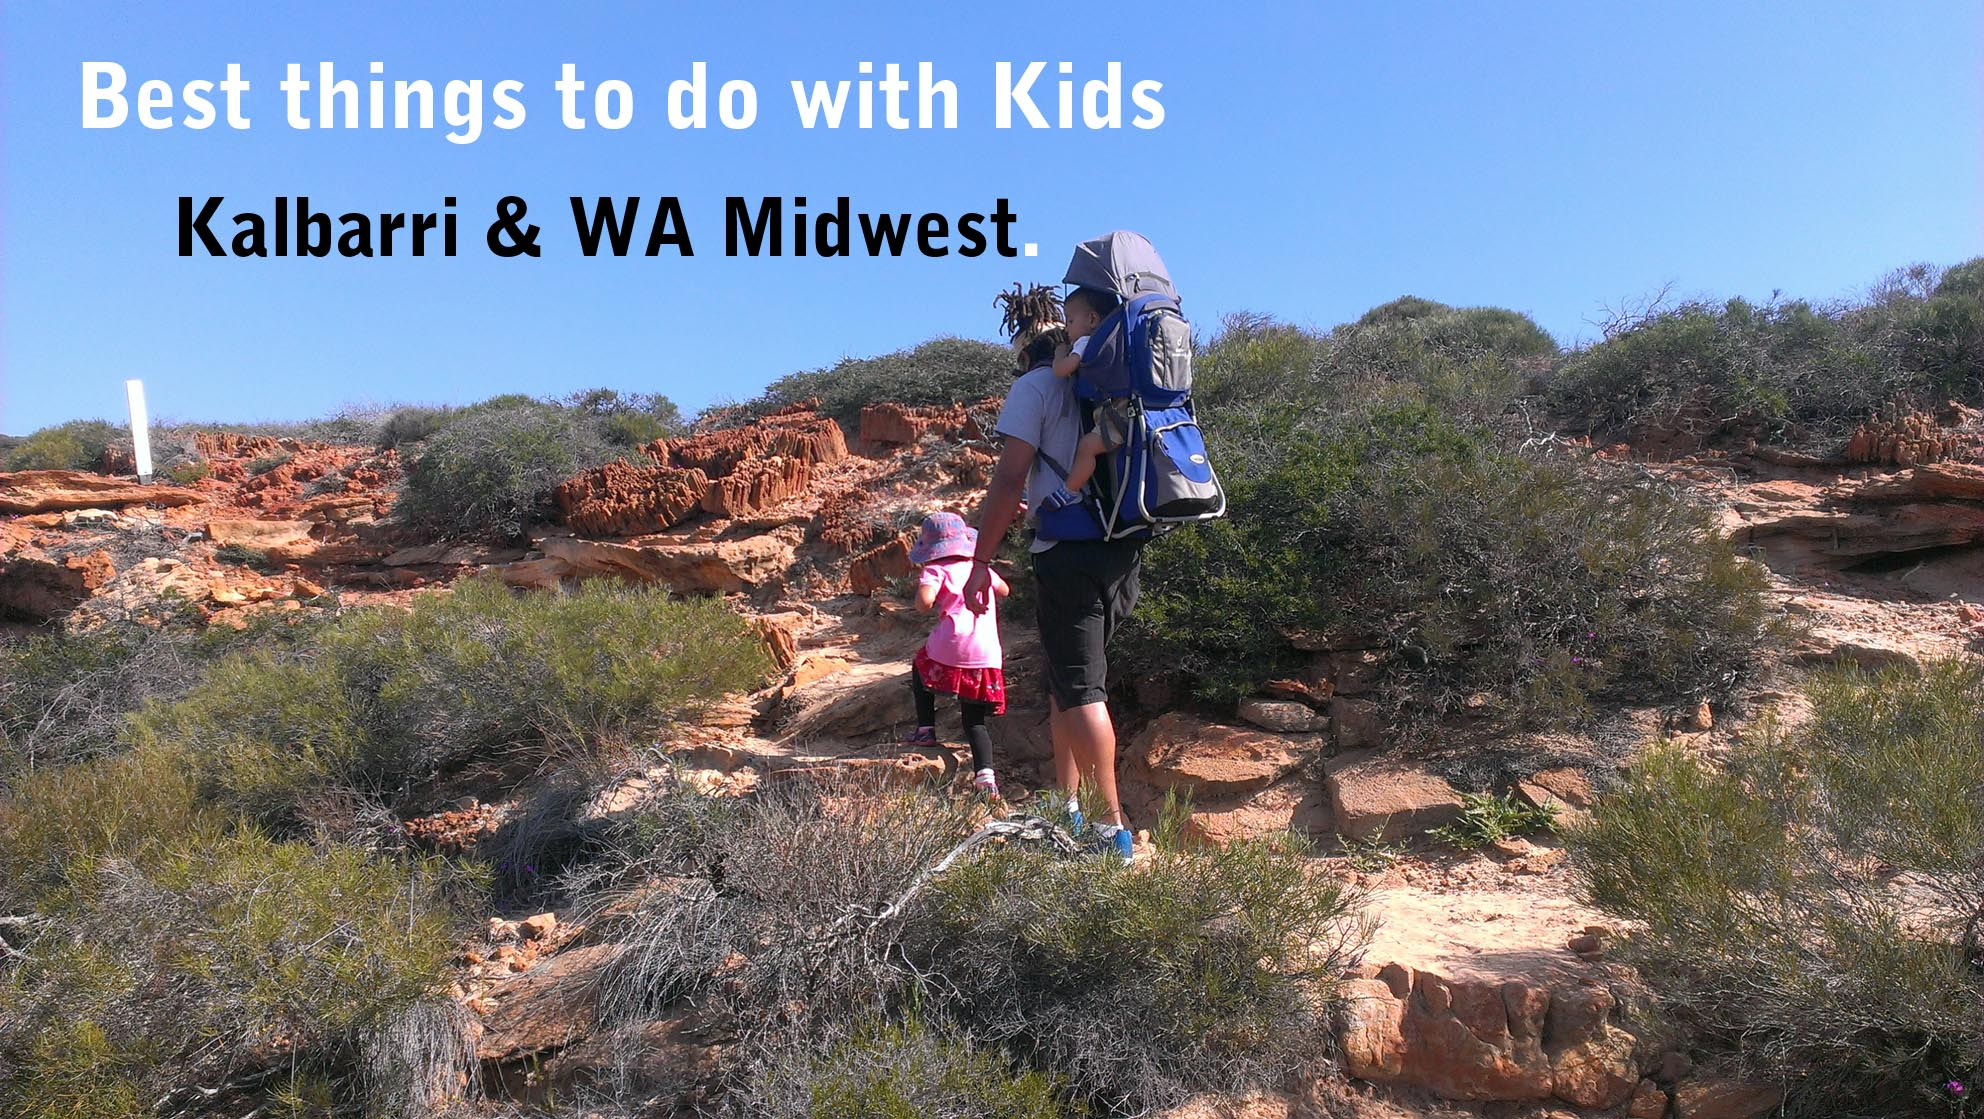 best things to do with kids Kalbarri & WA Midwest, Kalbarri Family Travel, Kalbarri with Kids